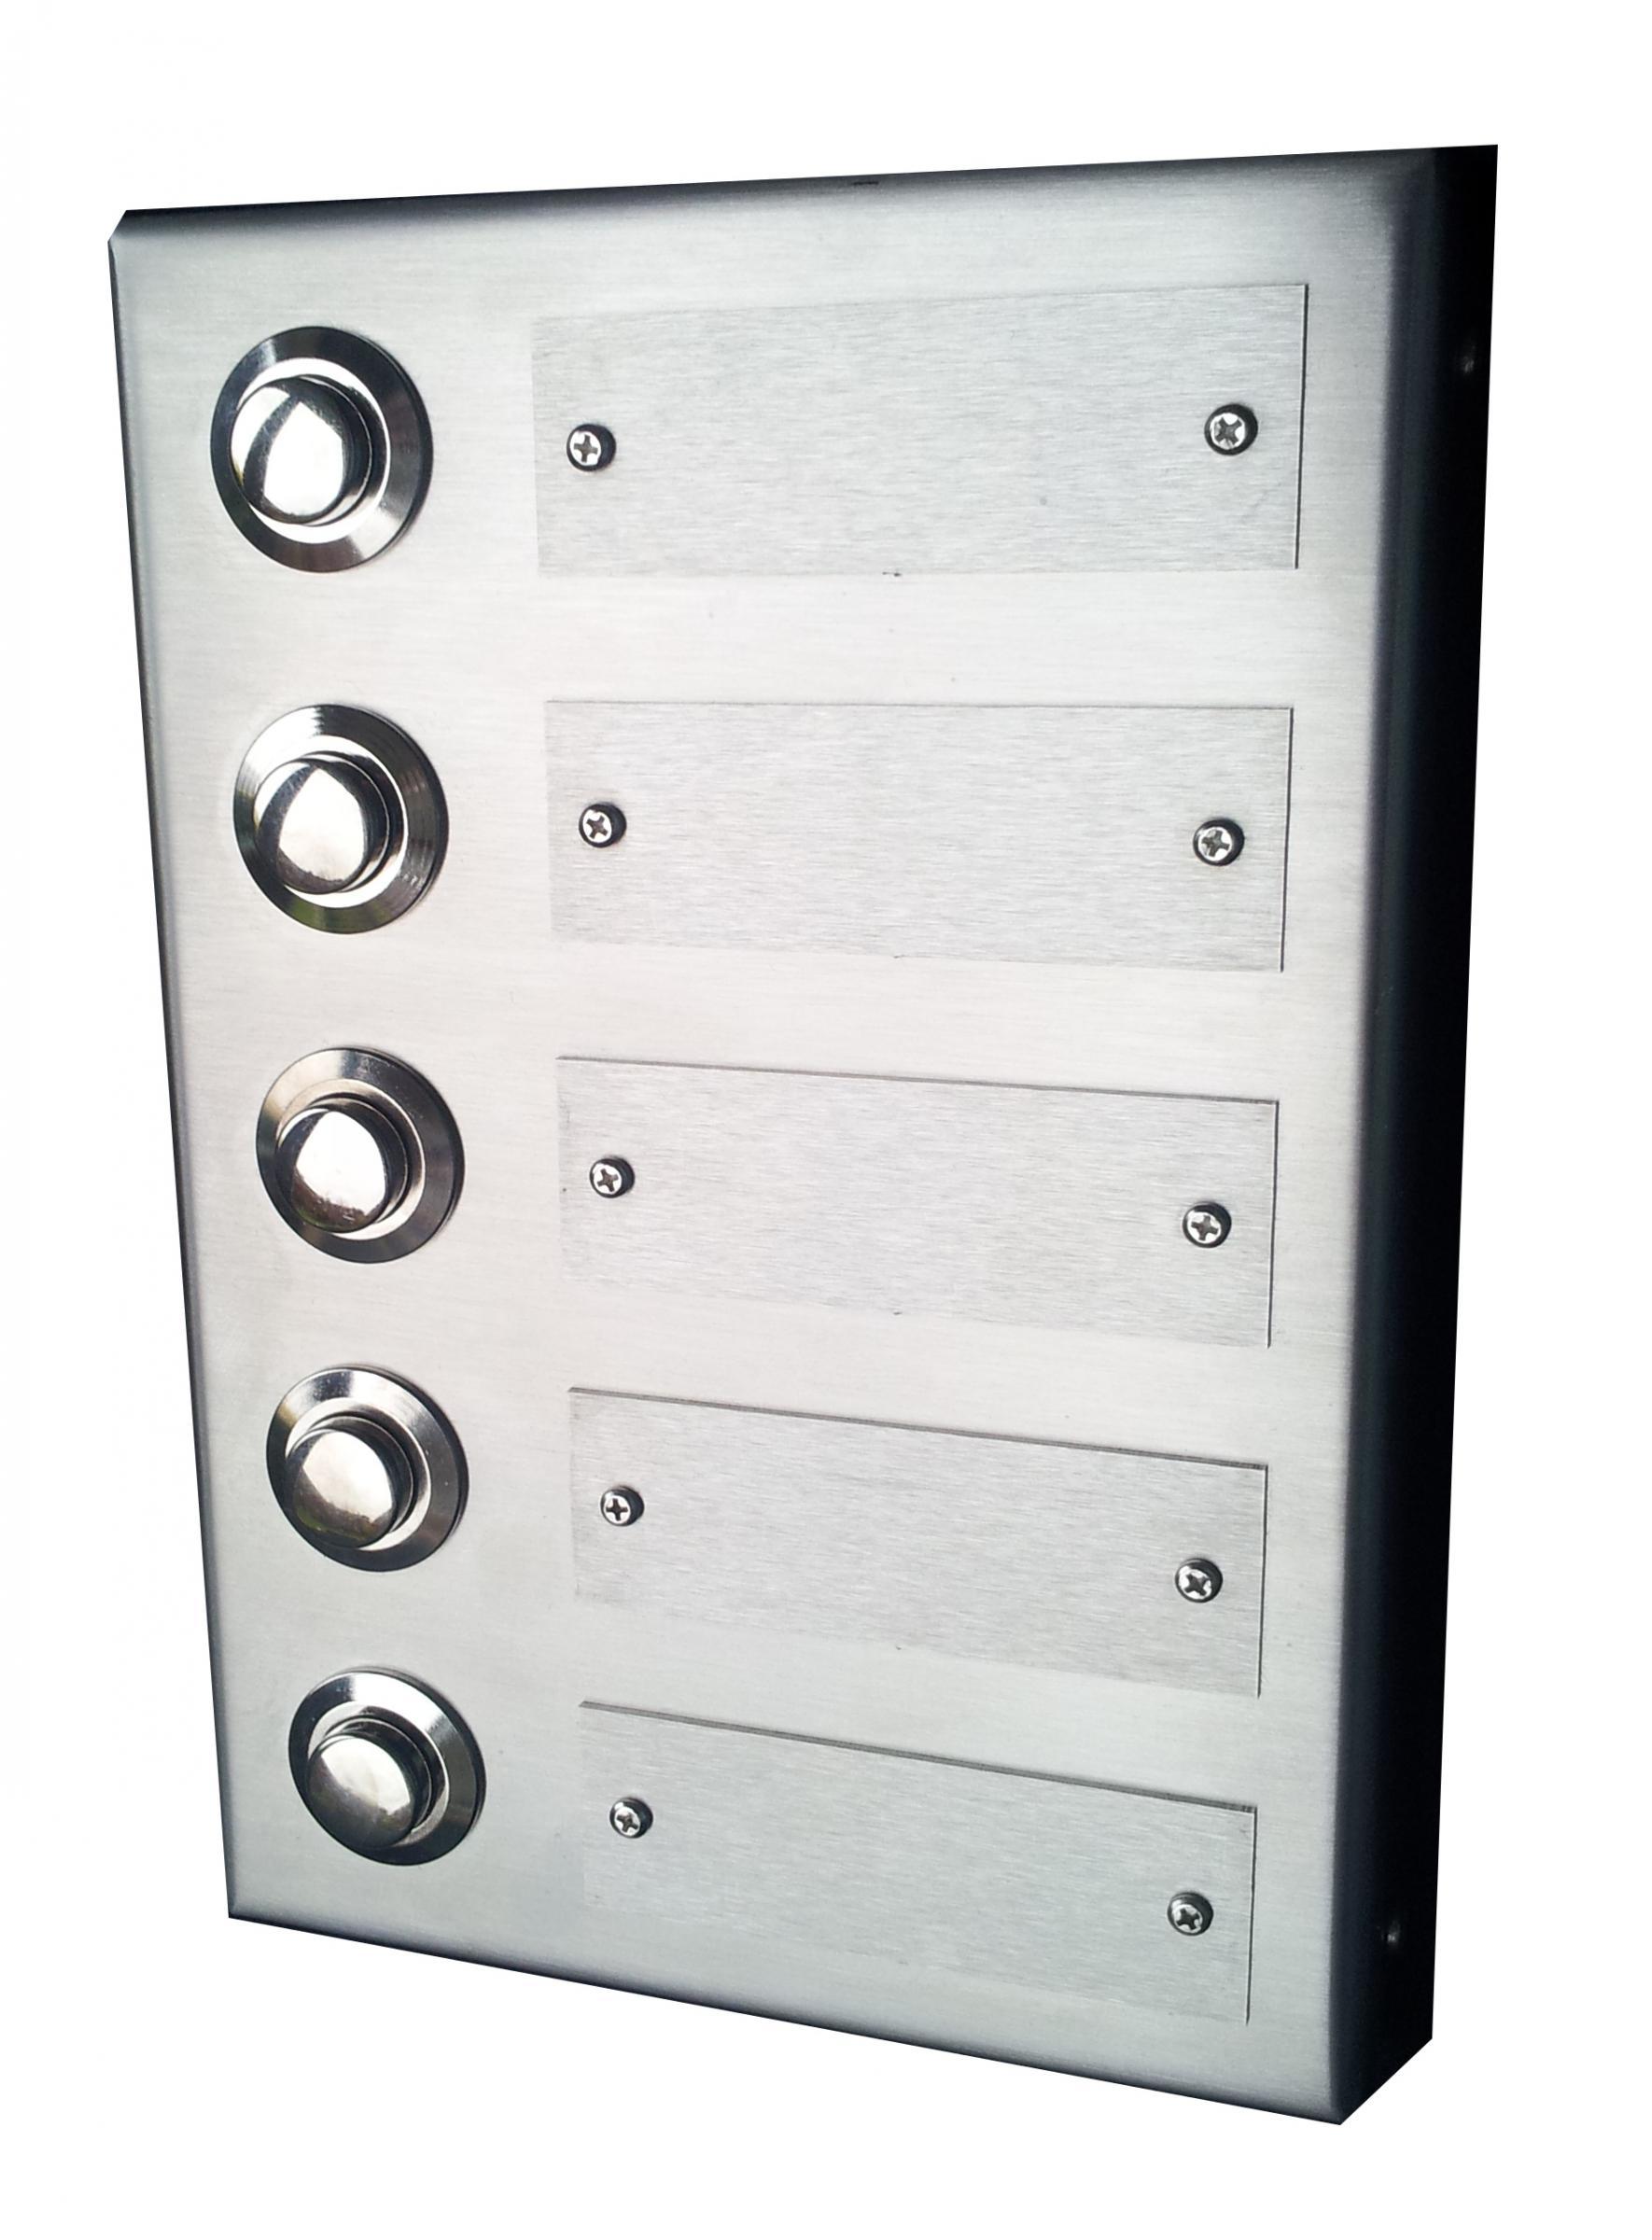 edelstahl aufputzklingelplatte pl n 5 gs edelstahl klingelschild edelstahl aufputzklingel. Black Bedroom Furniture Sets. Home Design Ideas